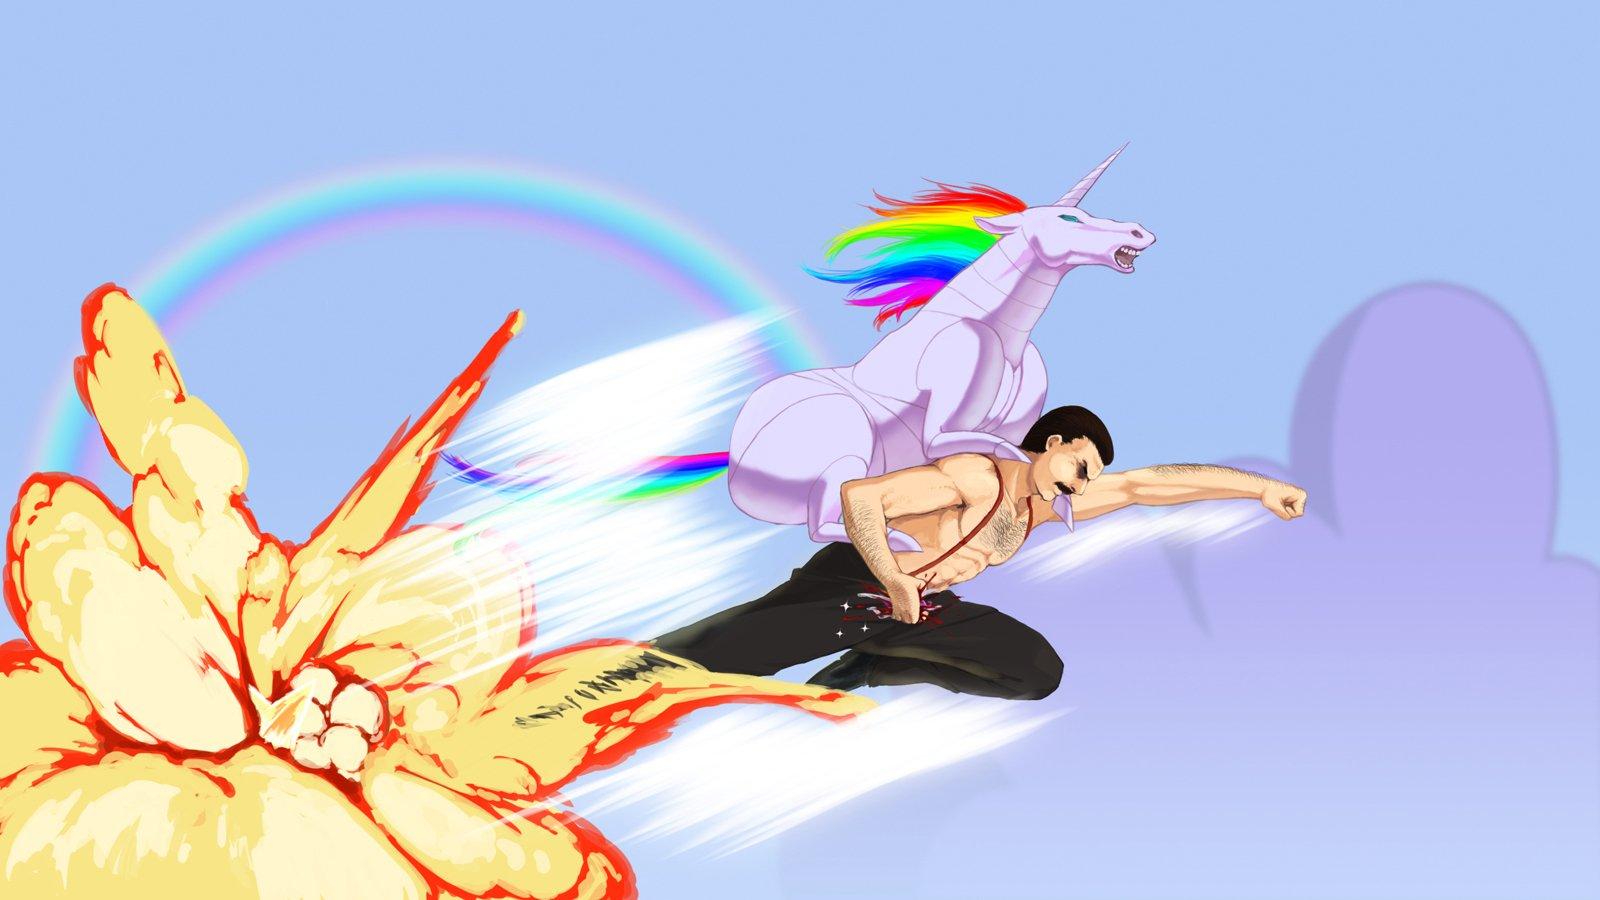 Mercury Hd Wallpaper Men Unicorns Fantasy Art Freddie Mercury Rainbows